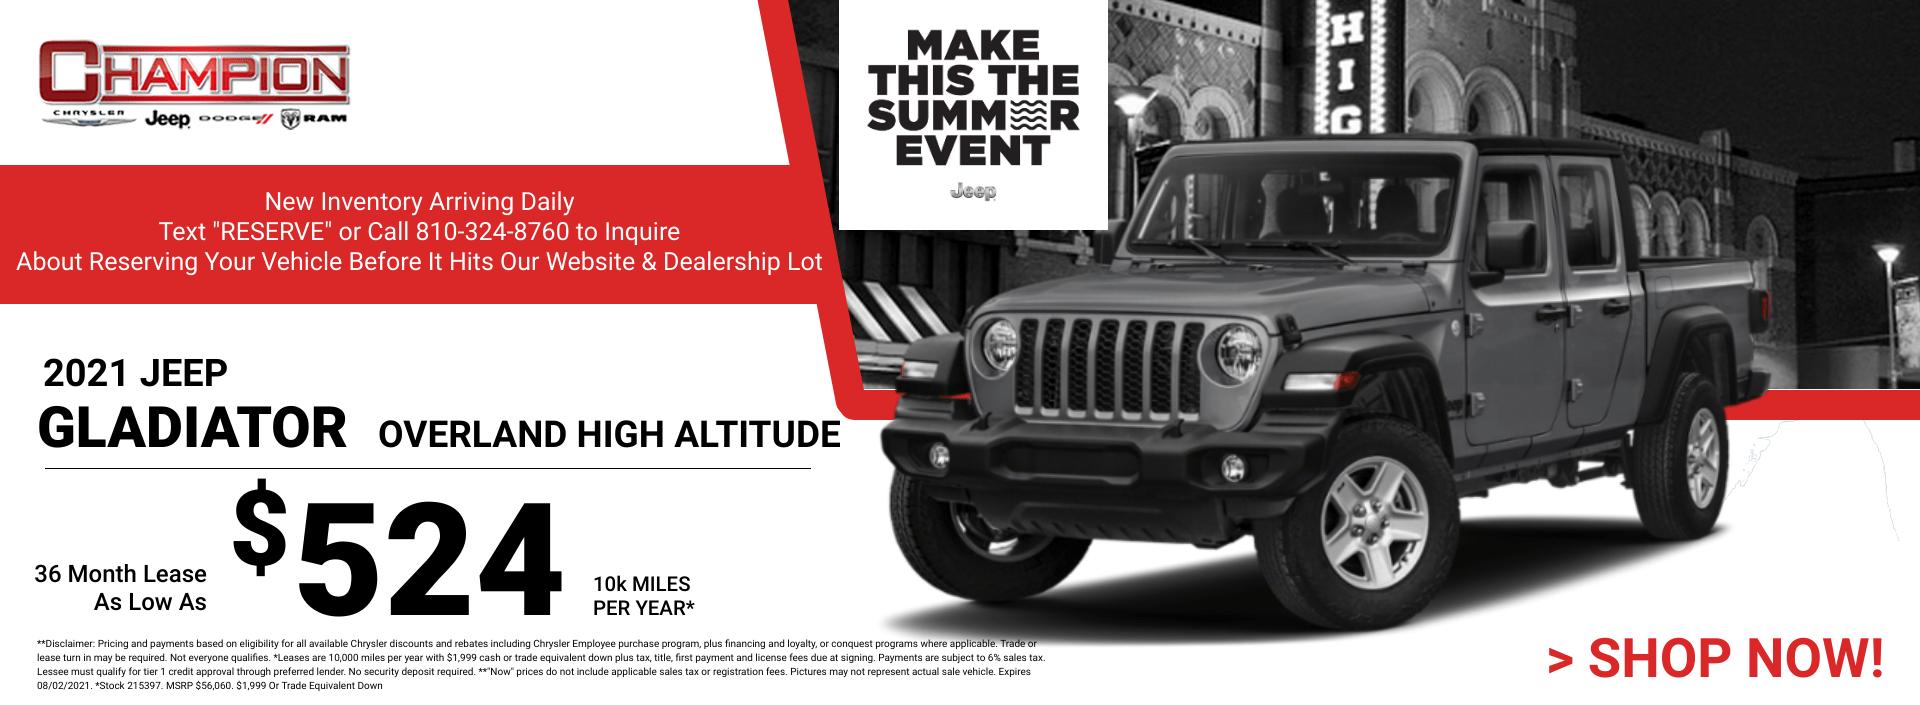 2021 Jeep Gladiator Overland High Altitude